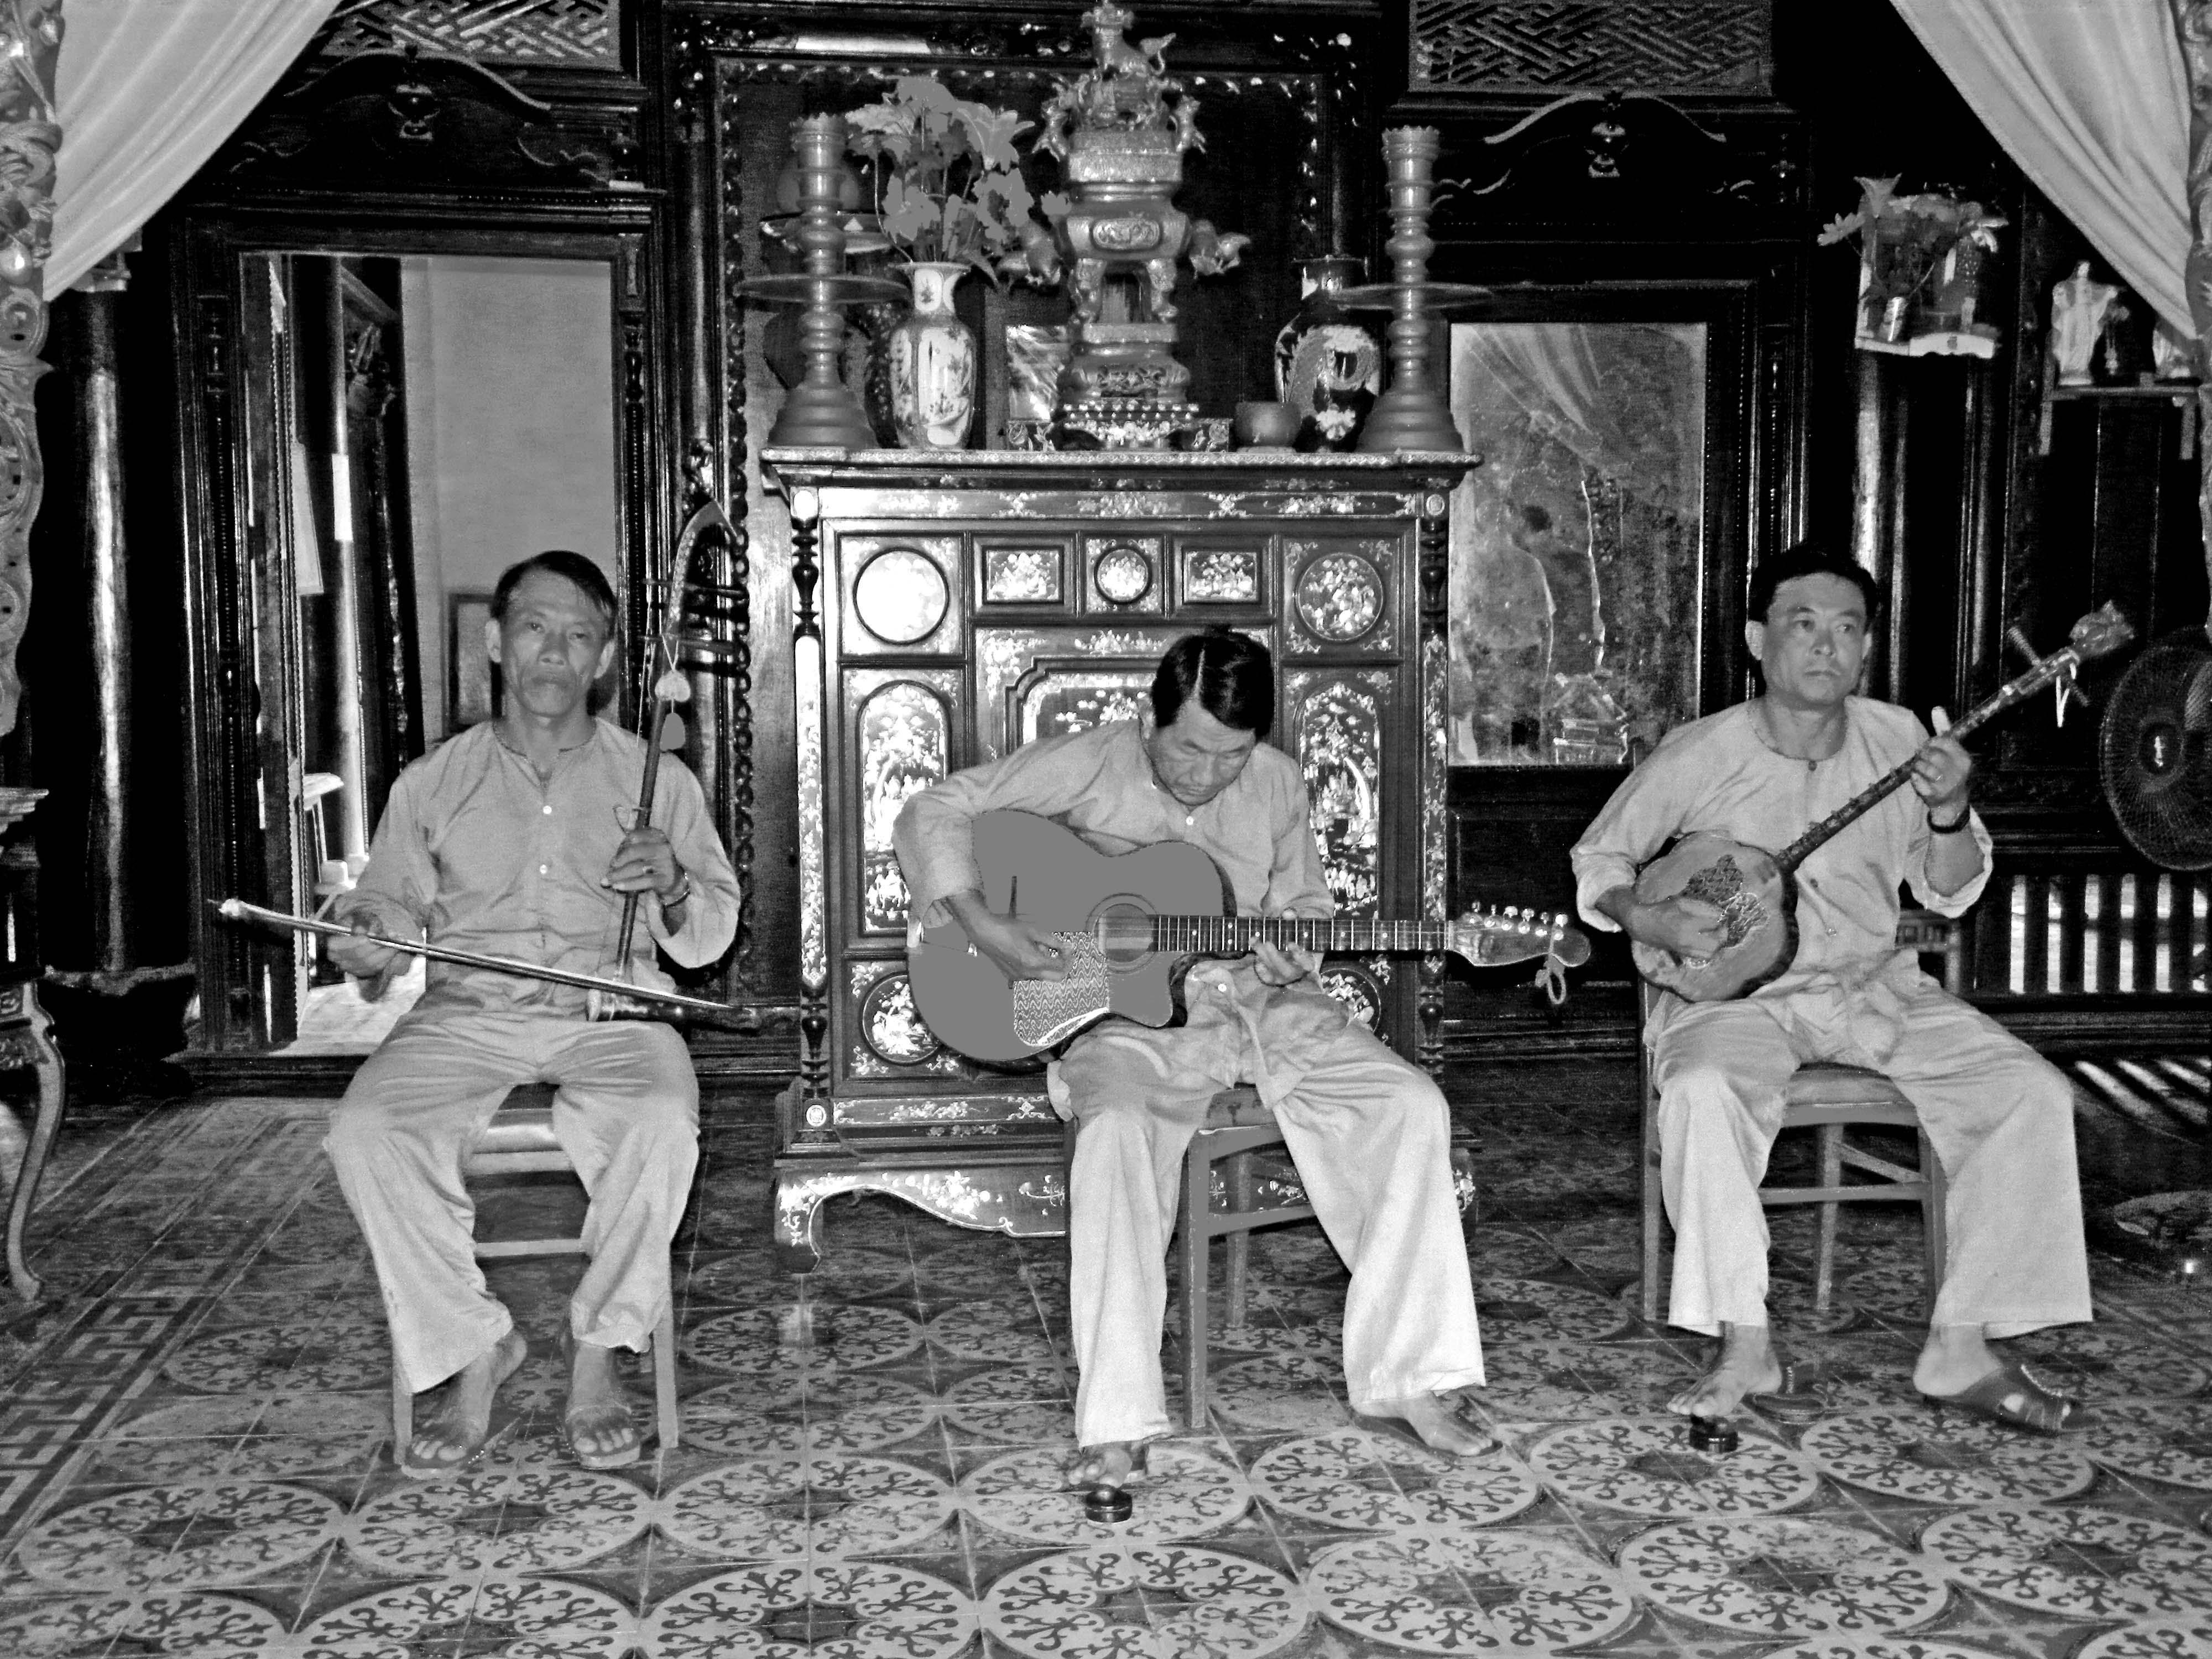 tall tales from the mekong delta Tall tales from the mekong delta, by kate bravermanpdf download tall tales from the mekong delta, by kate bravermanpdf (555 kb).